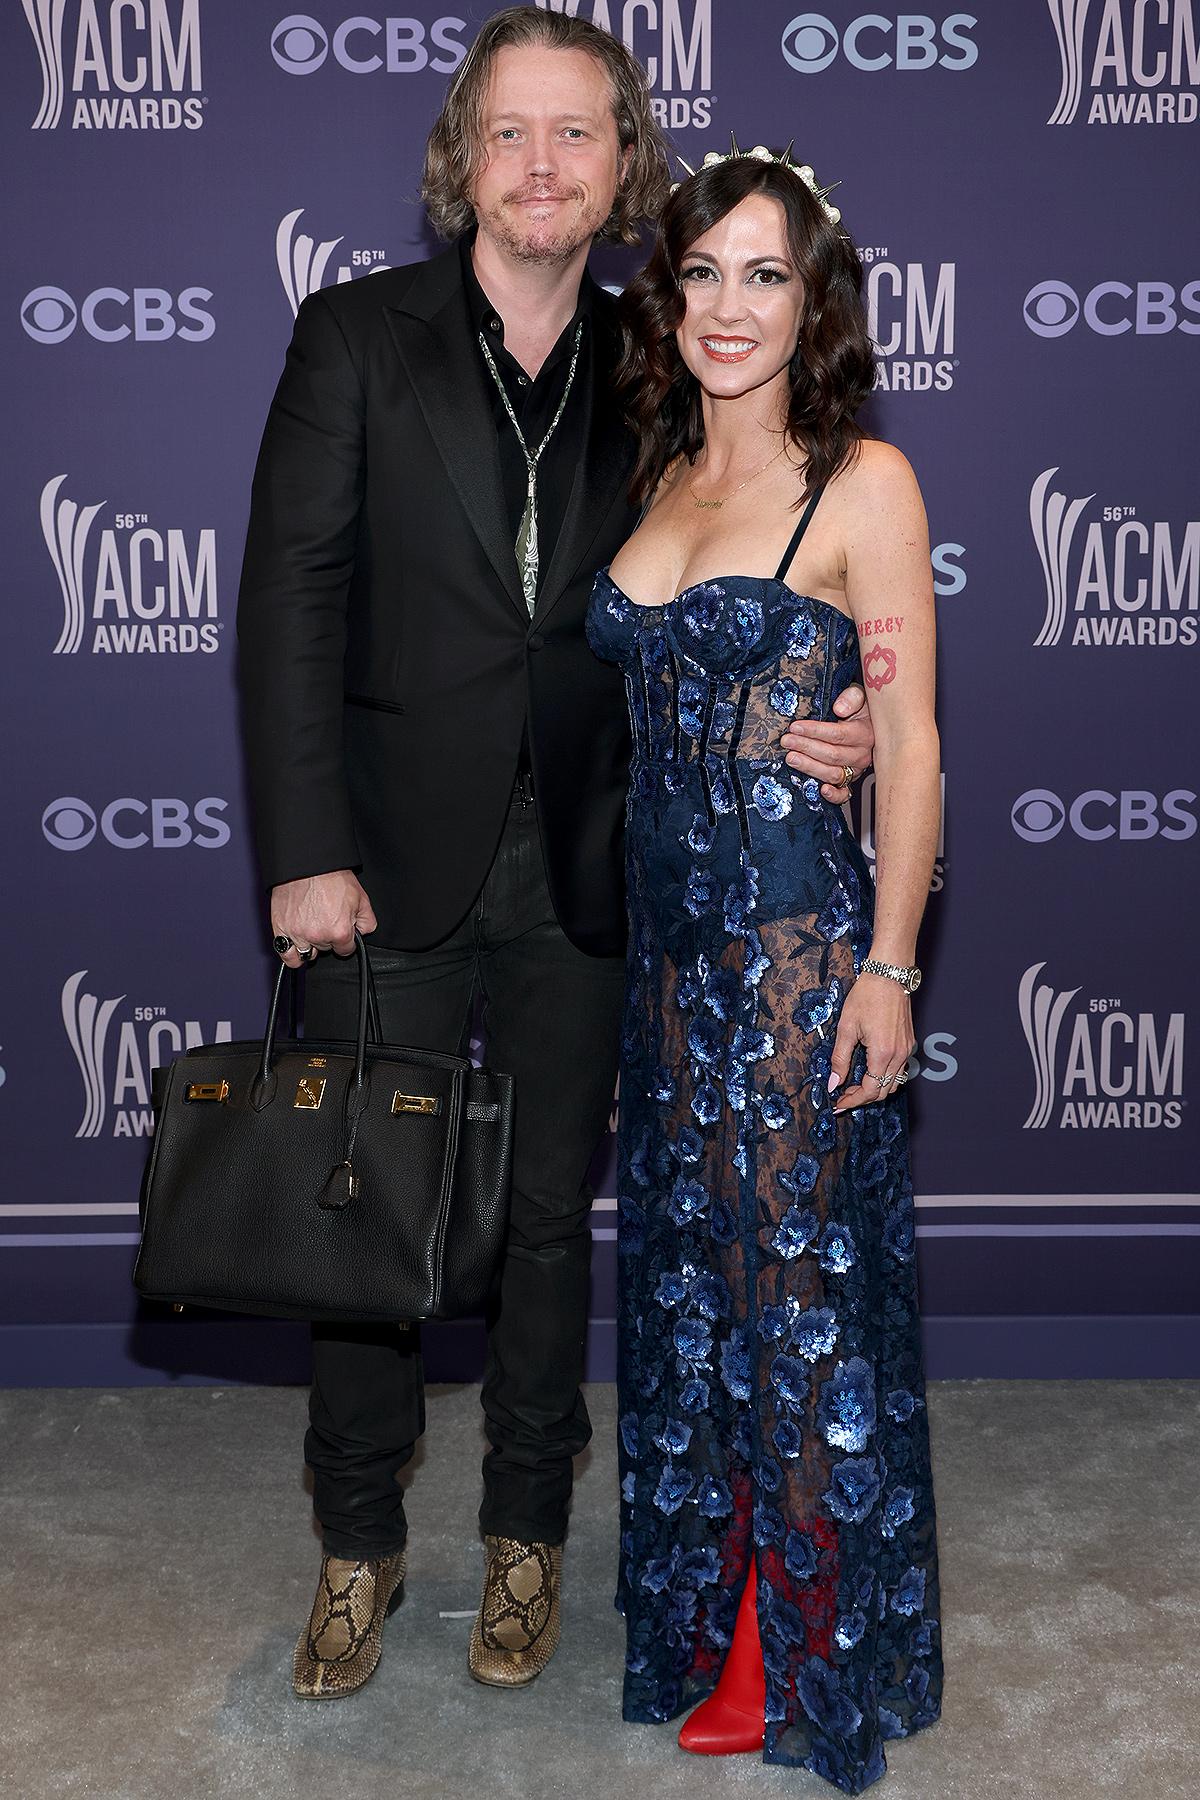 Jason Isbell and Amanda Shires